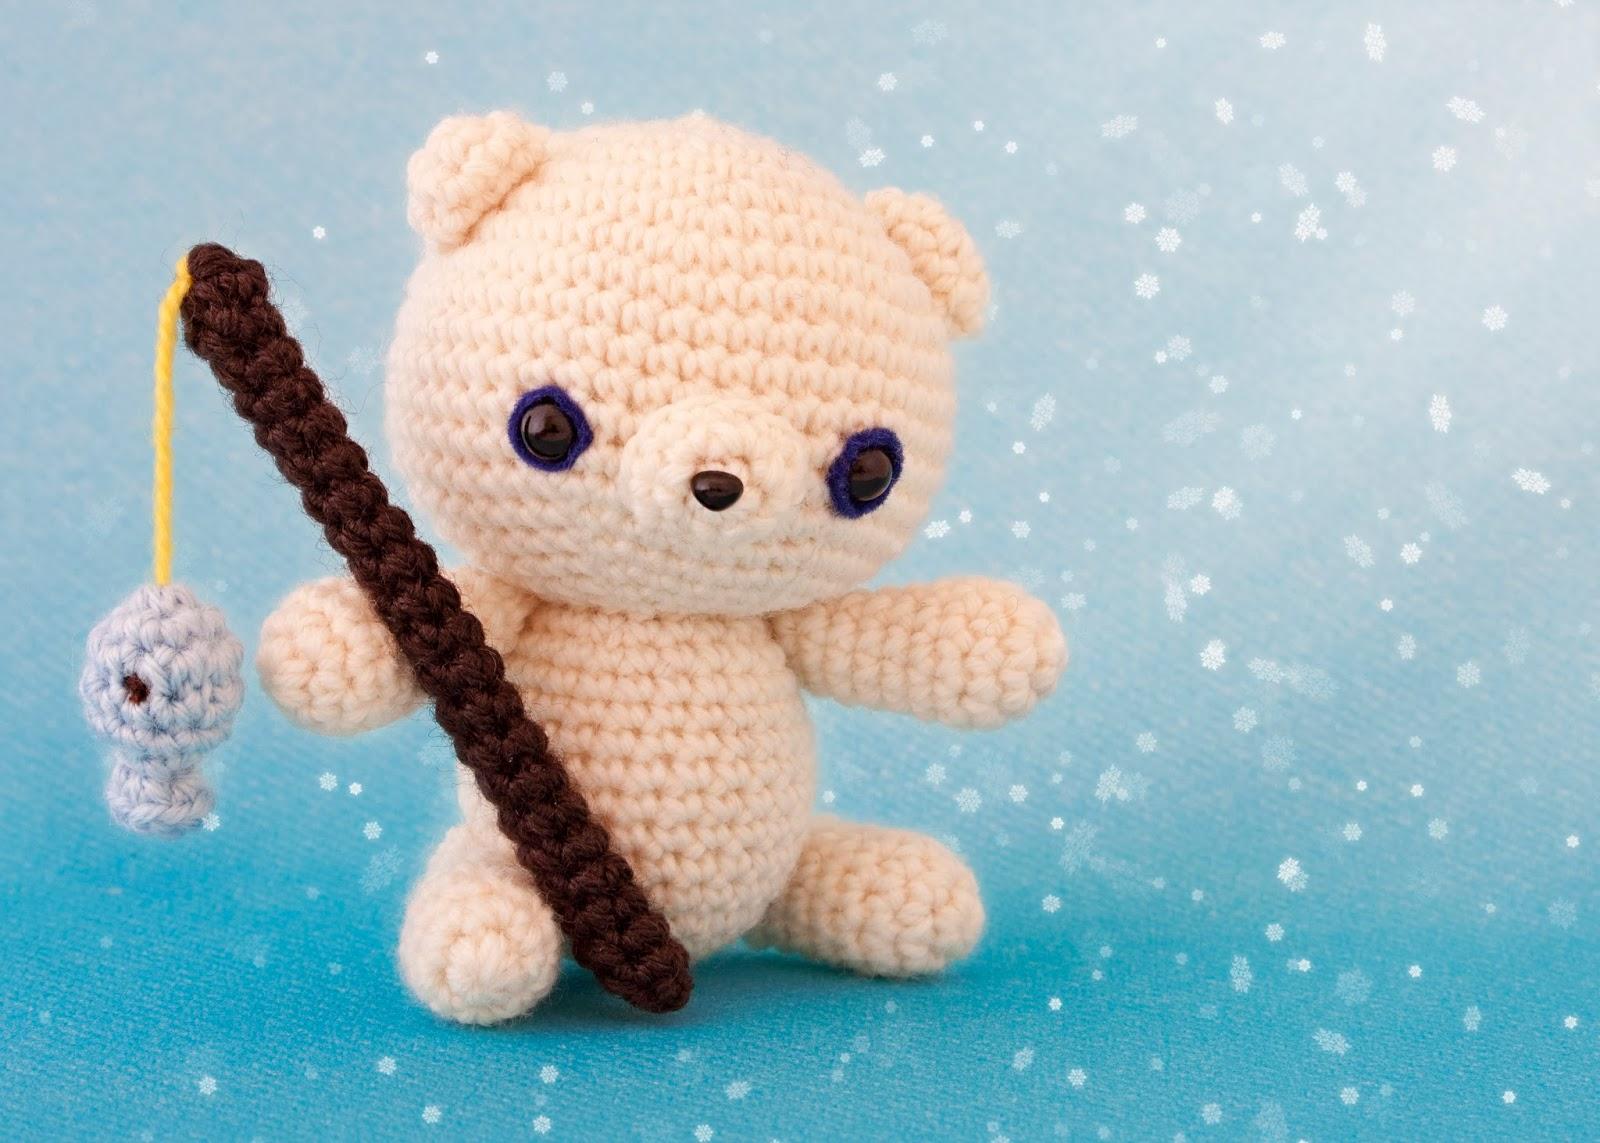 Amigurumi Oso Panda Patron : Mis pequicosas kuma el oso polar